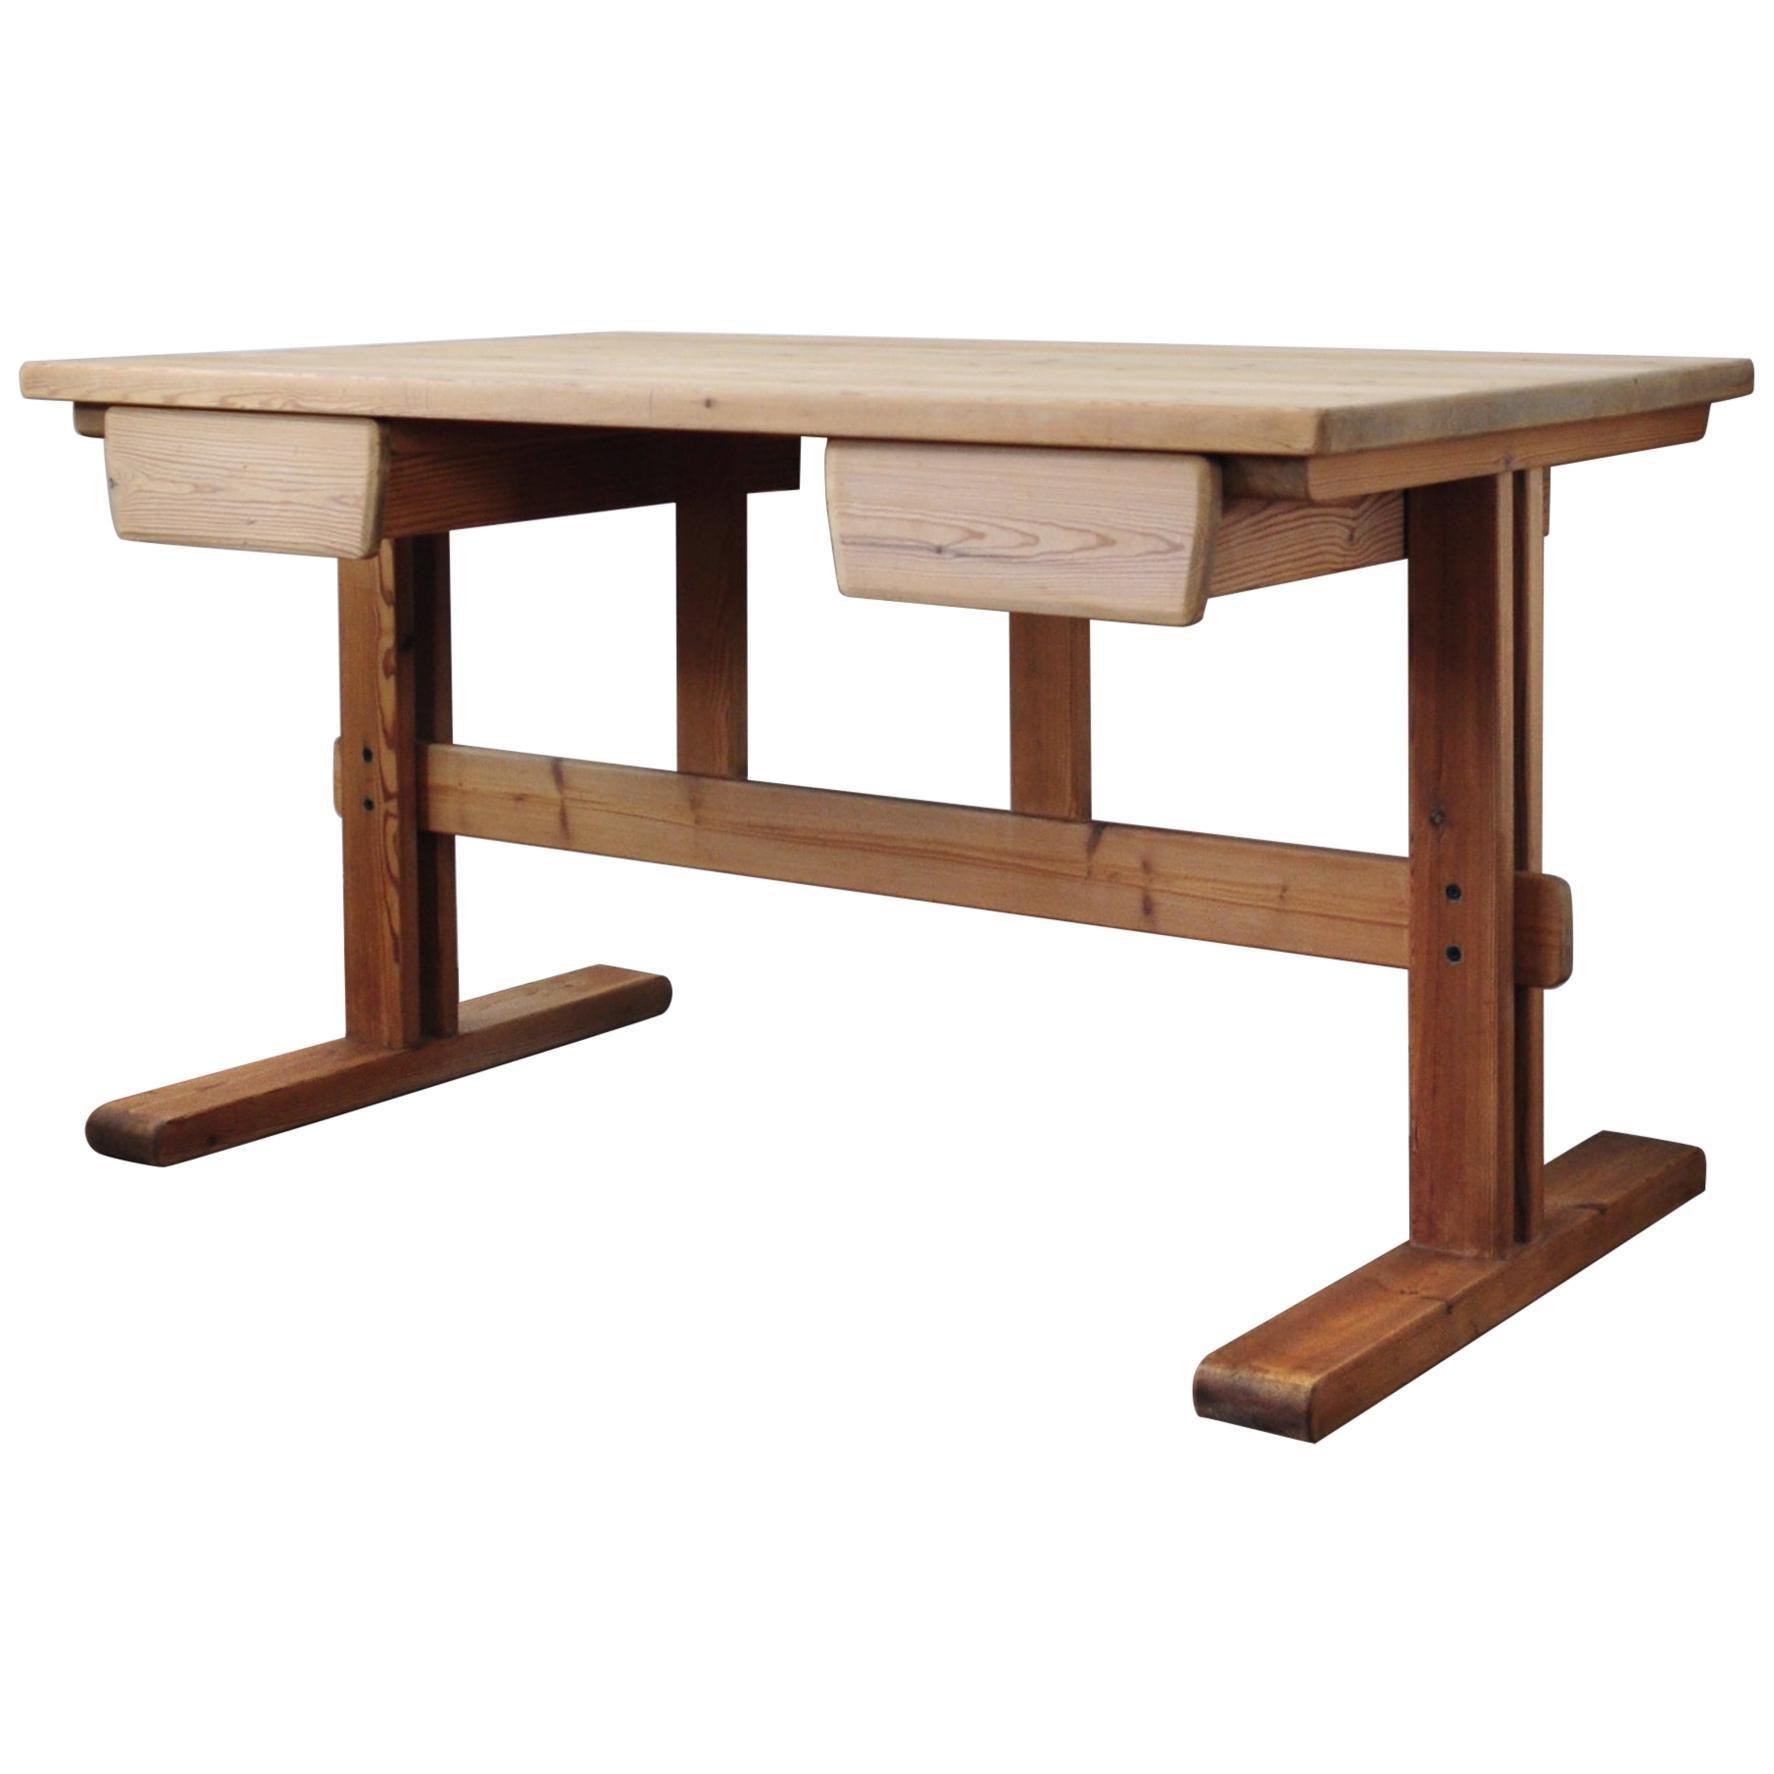 Scandinavian Modern Desk in Solid Pine, 1970s